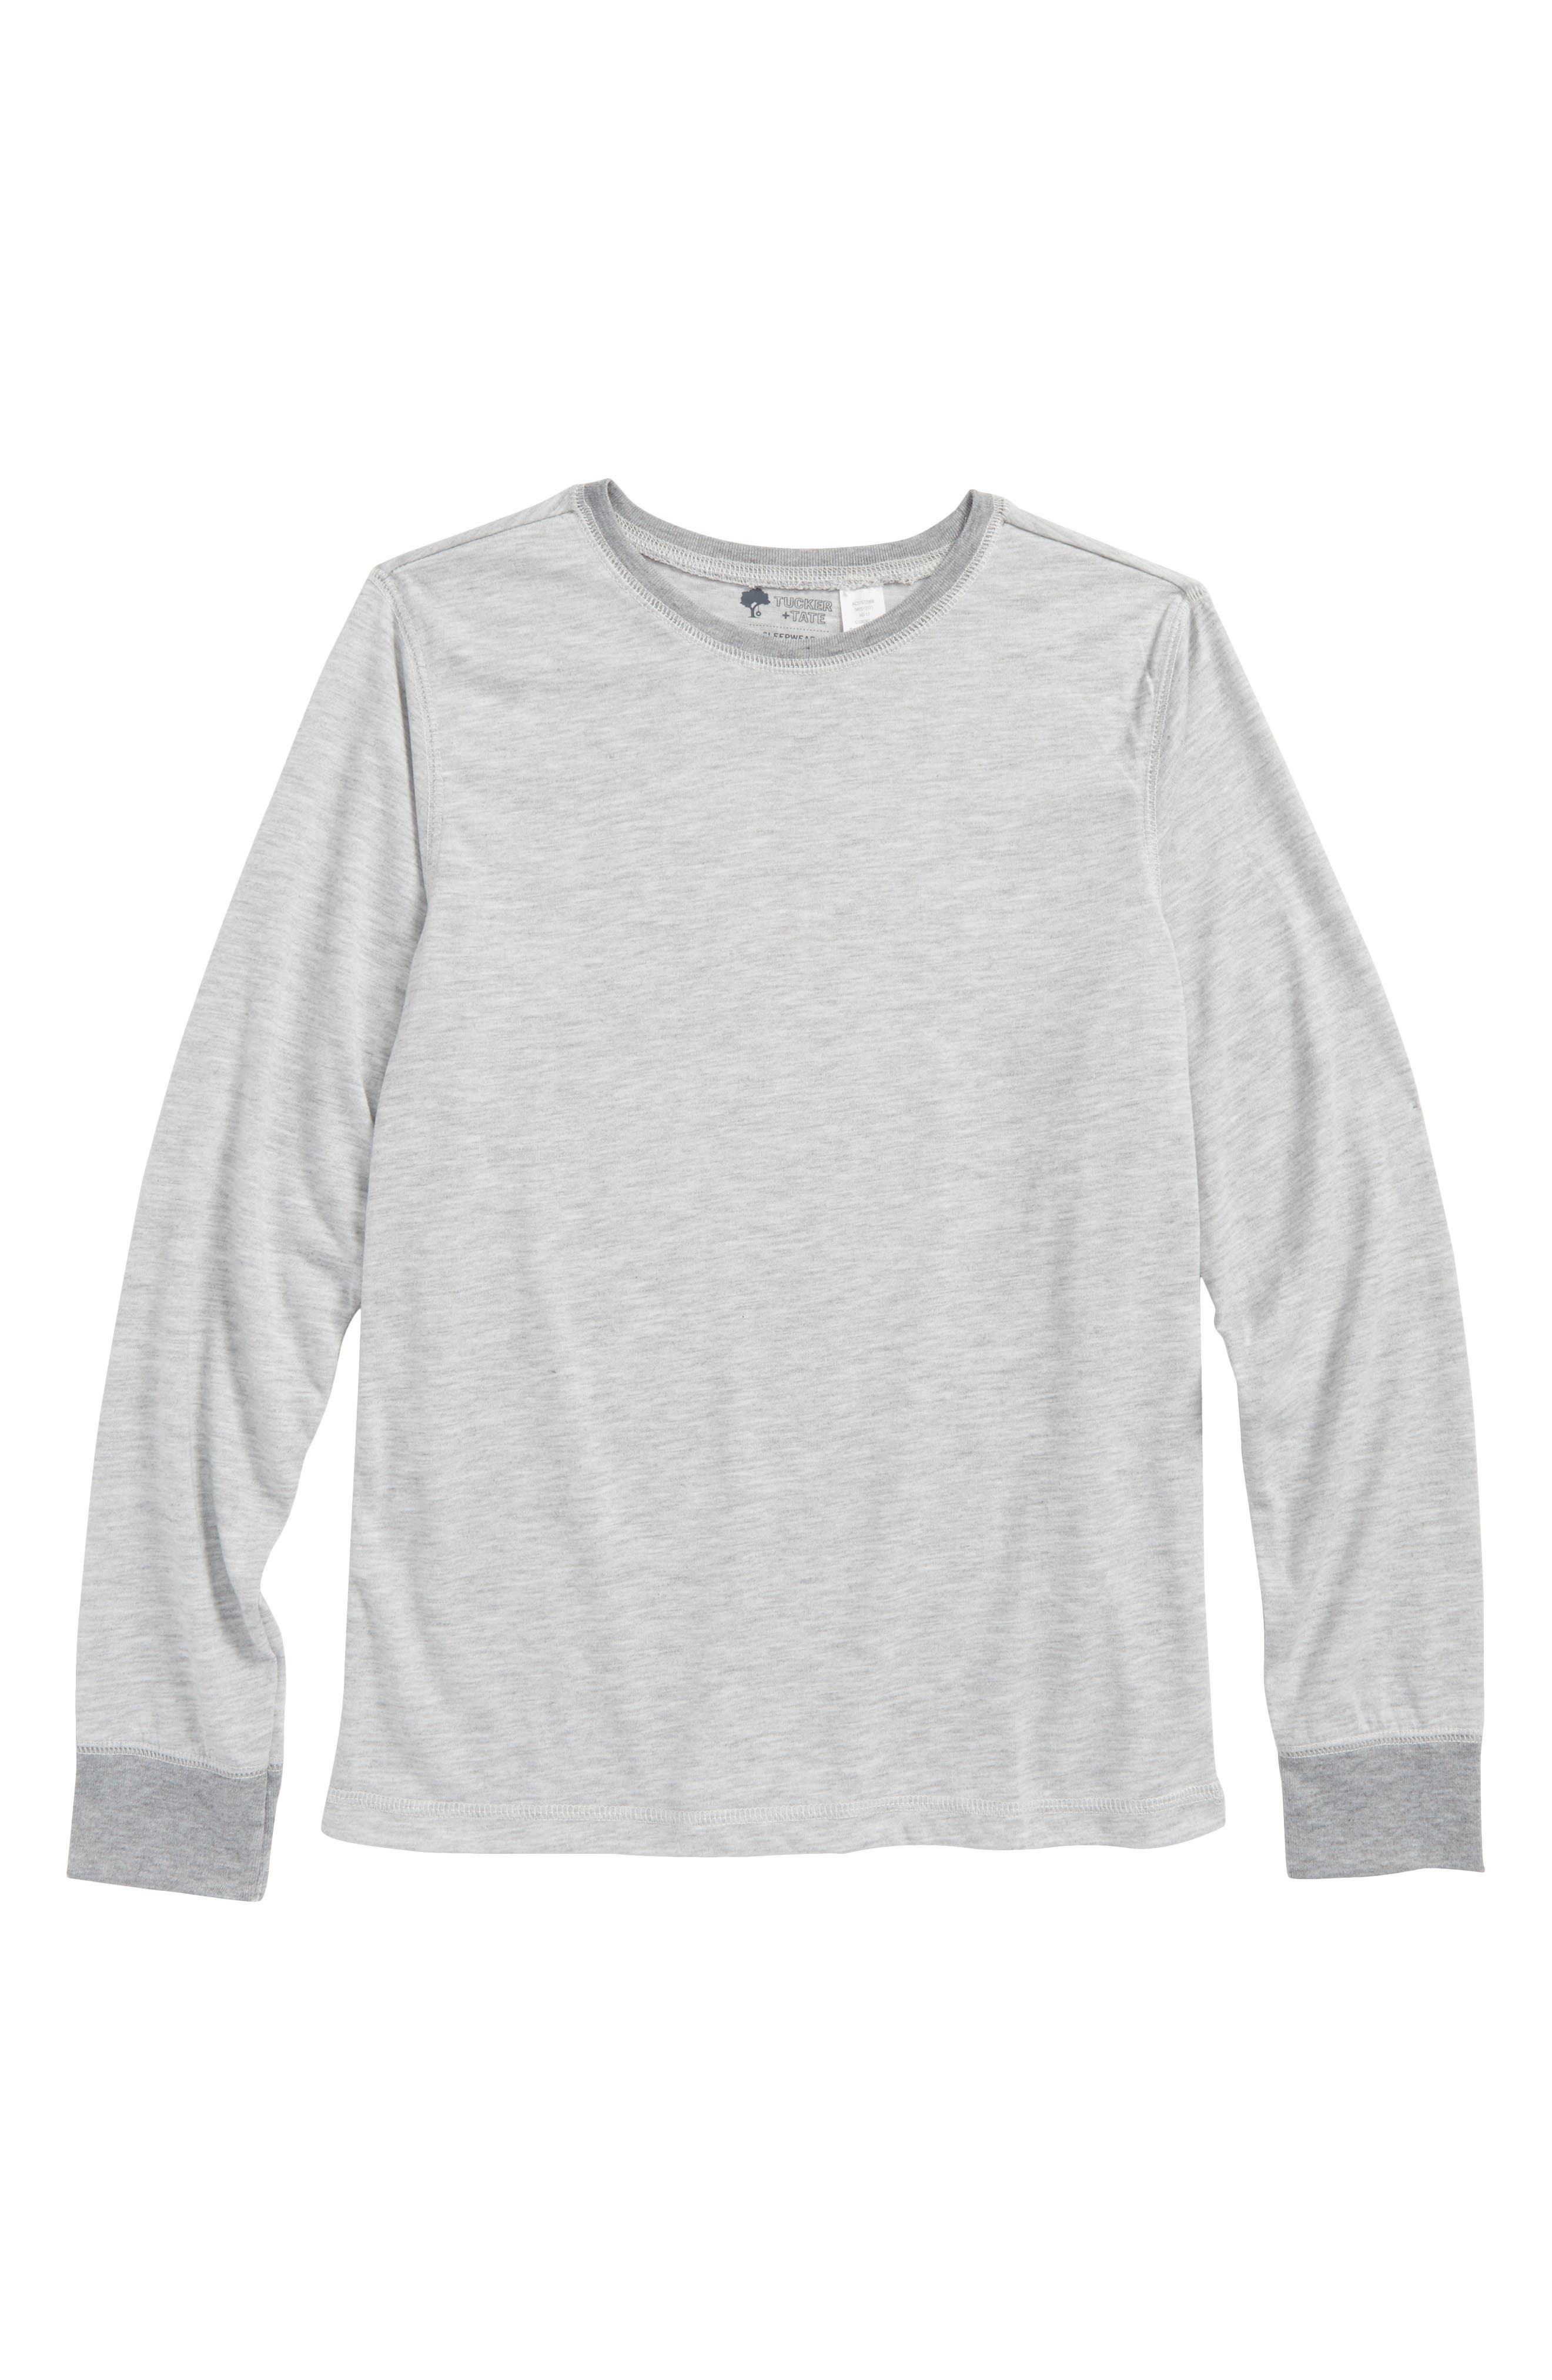 Tucker & Tate Long Sleeve Sleep T-Shirt,                         Main,                         color, GREY ASH HEATHER